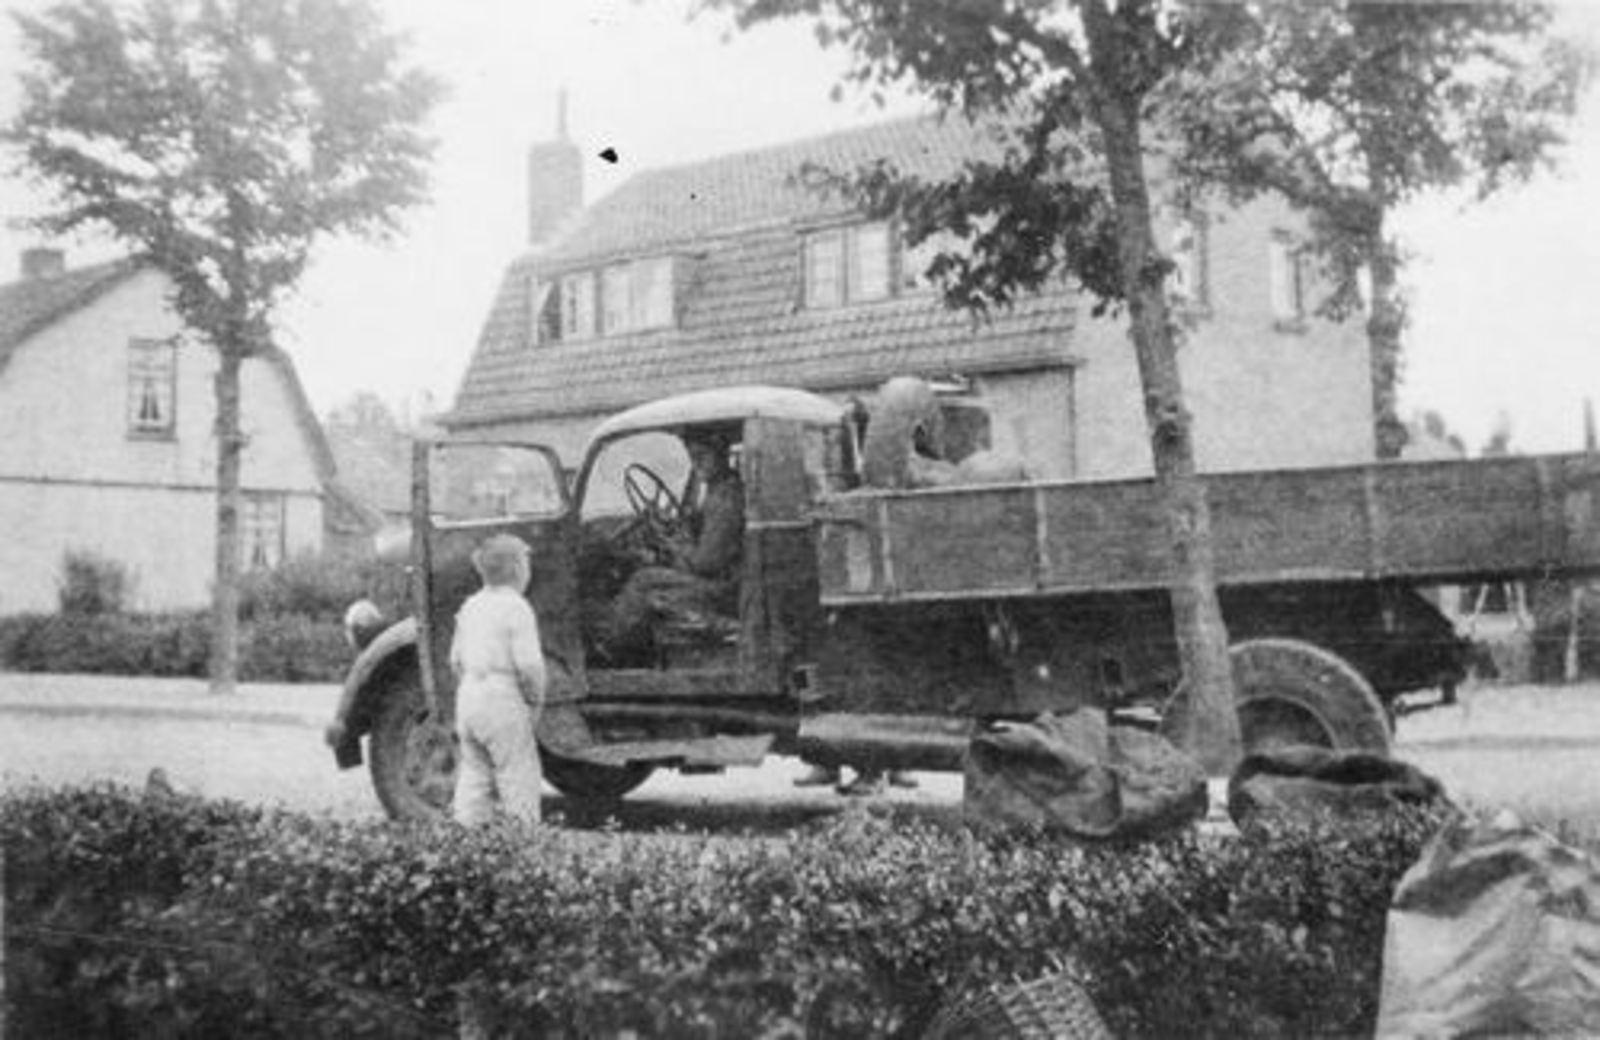 Fortweg O 0028-30 1945± met Fons Koolbergen op Vrachtwagen